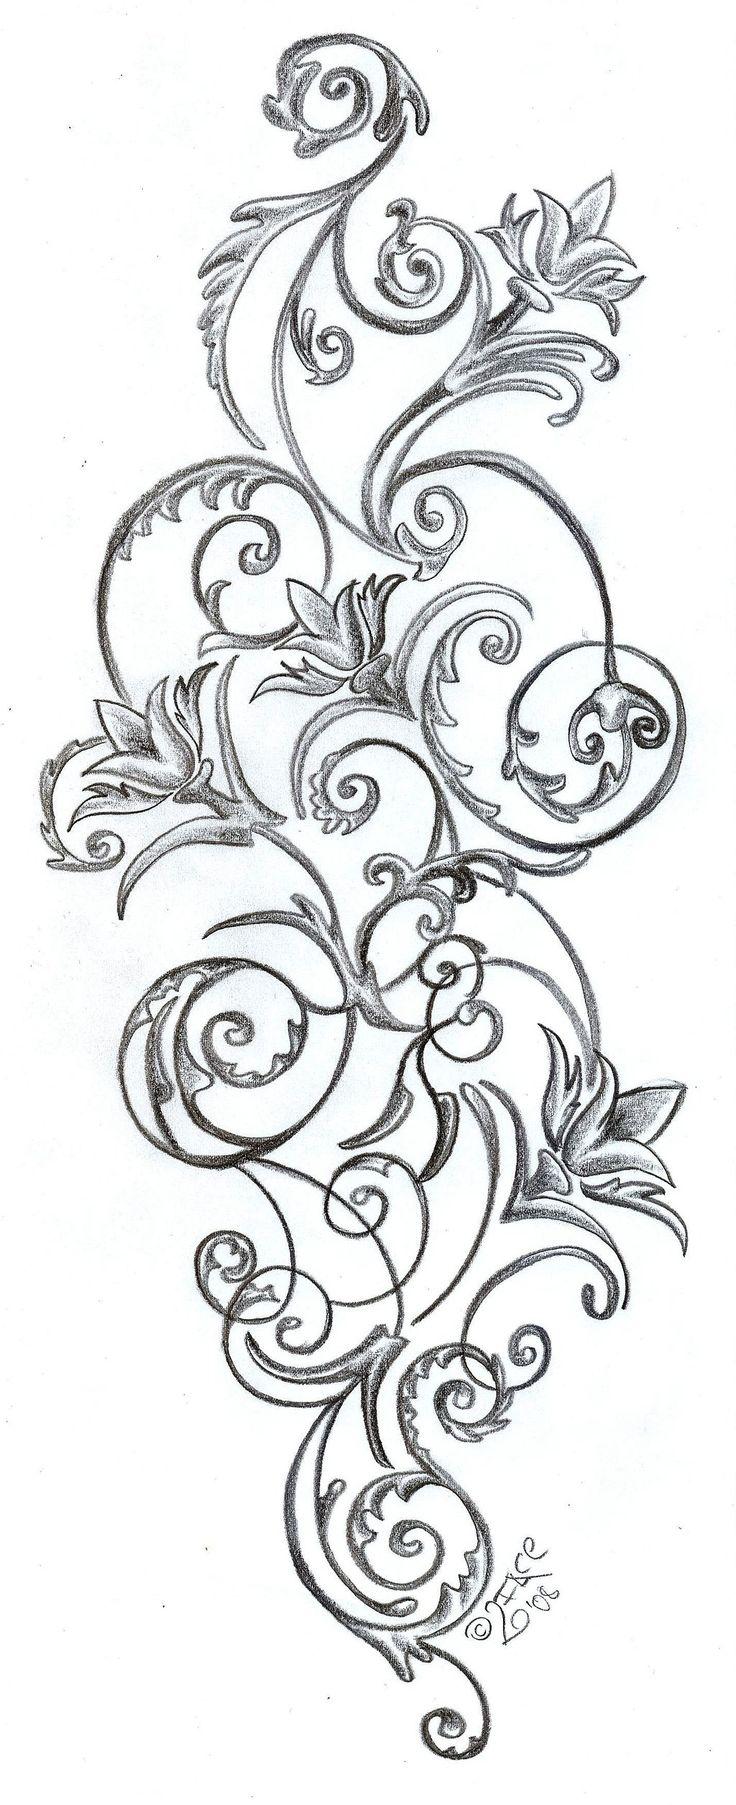 Family tree tattoo google search tattoo ideas pinterest family tree tattoo google search tattoo ideas pinterest tattoo tatoo and family tattoo designs izmirmasajfo Gallery